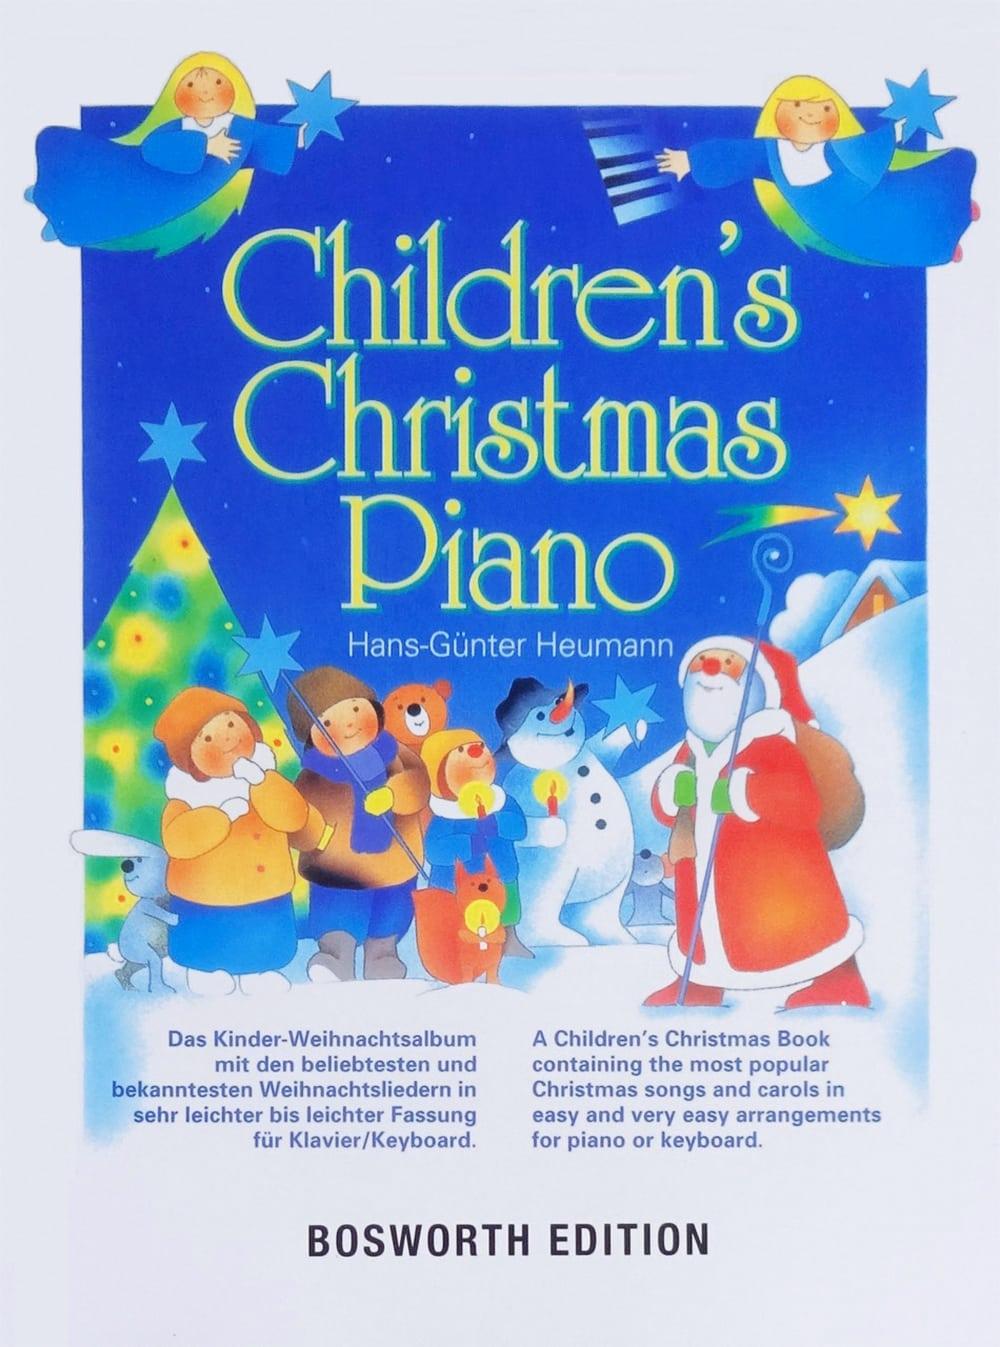 Childrens Christmas Piano: Das Kinder Weihnachtsalbum